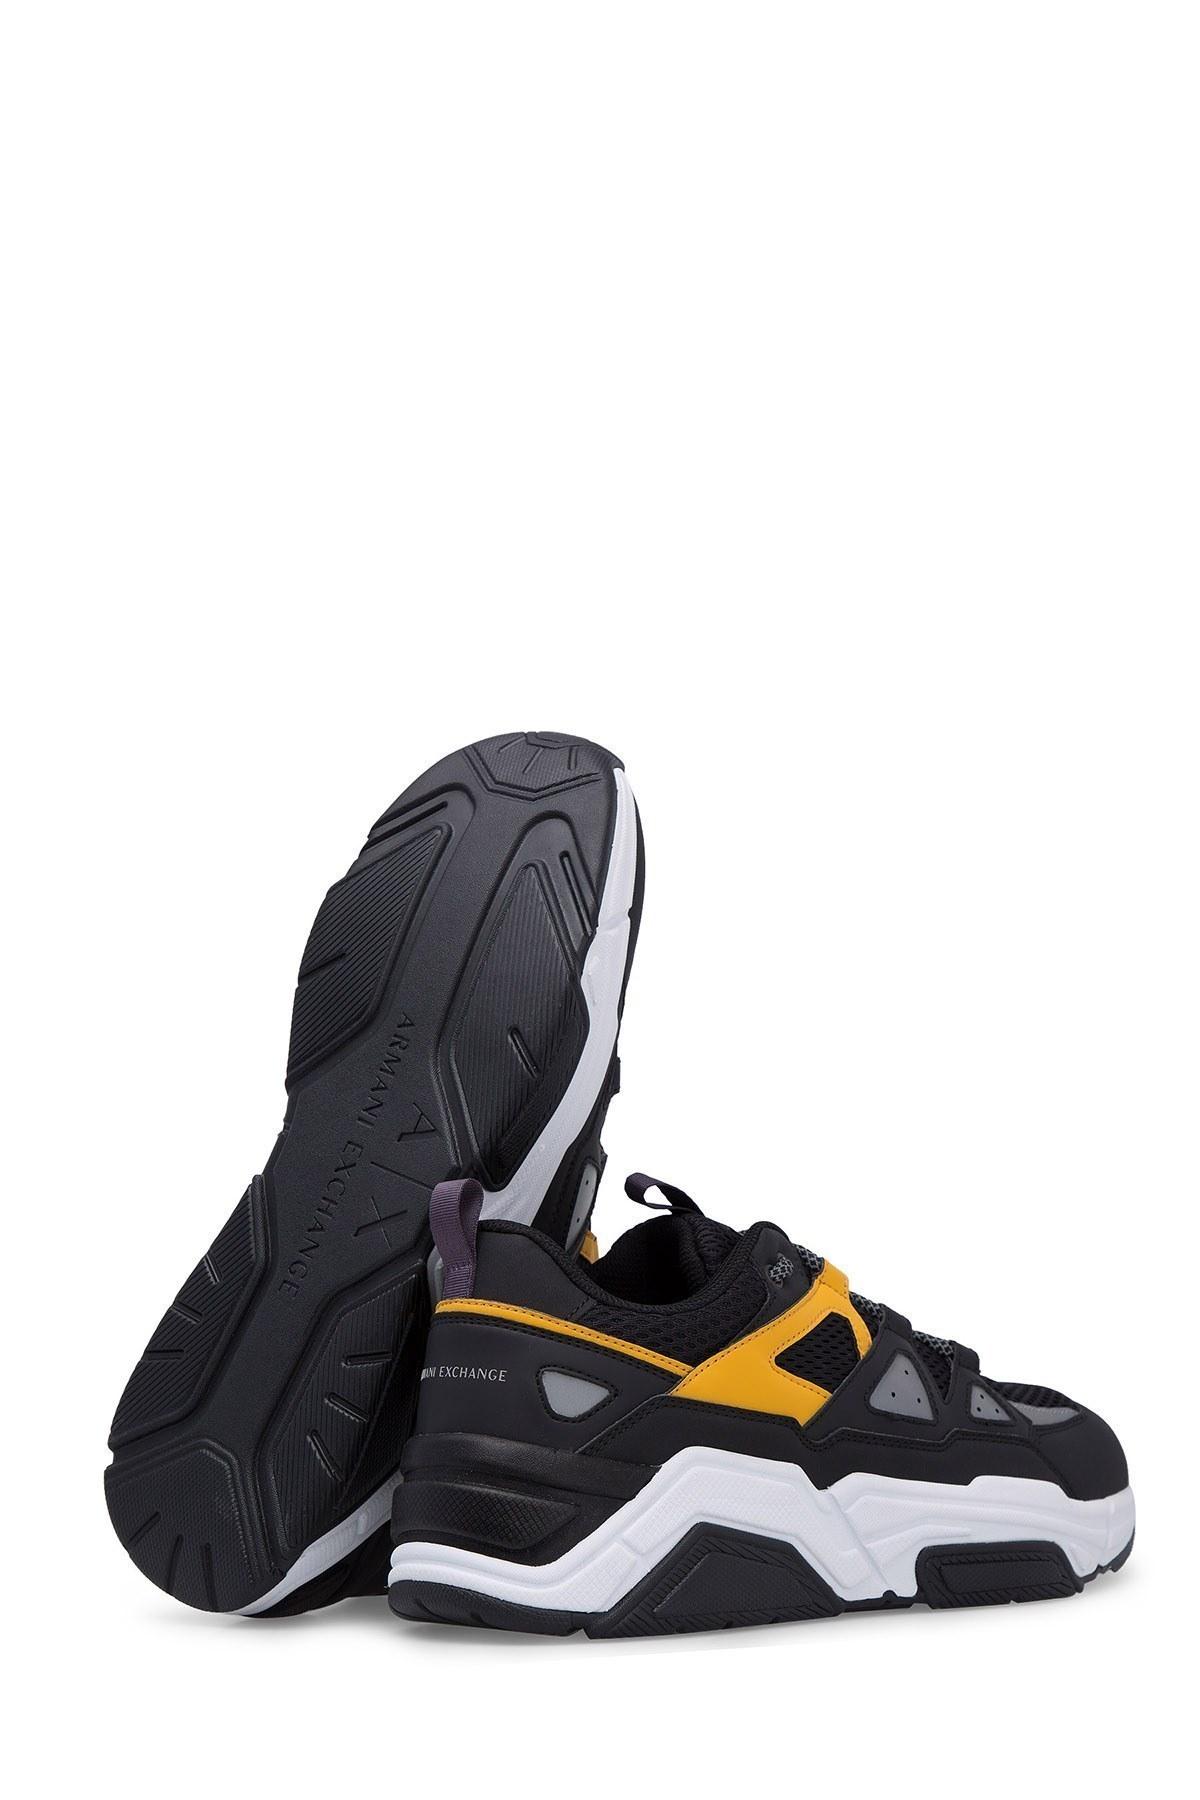 Armani Exchange Erkek Ayakkabı XUX044 XV183 A154 SİYAH